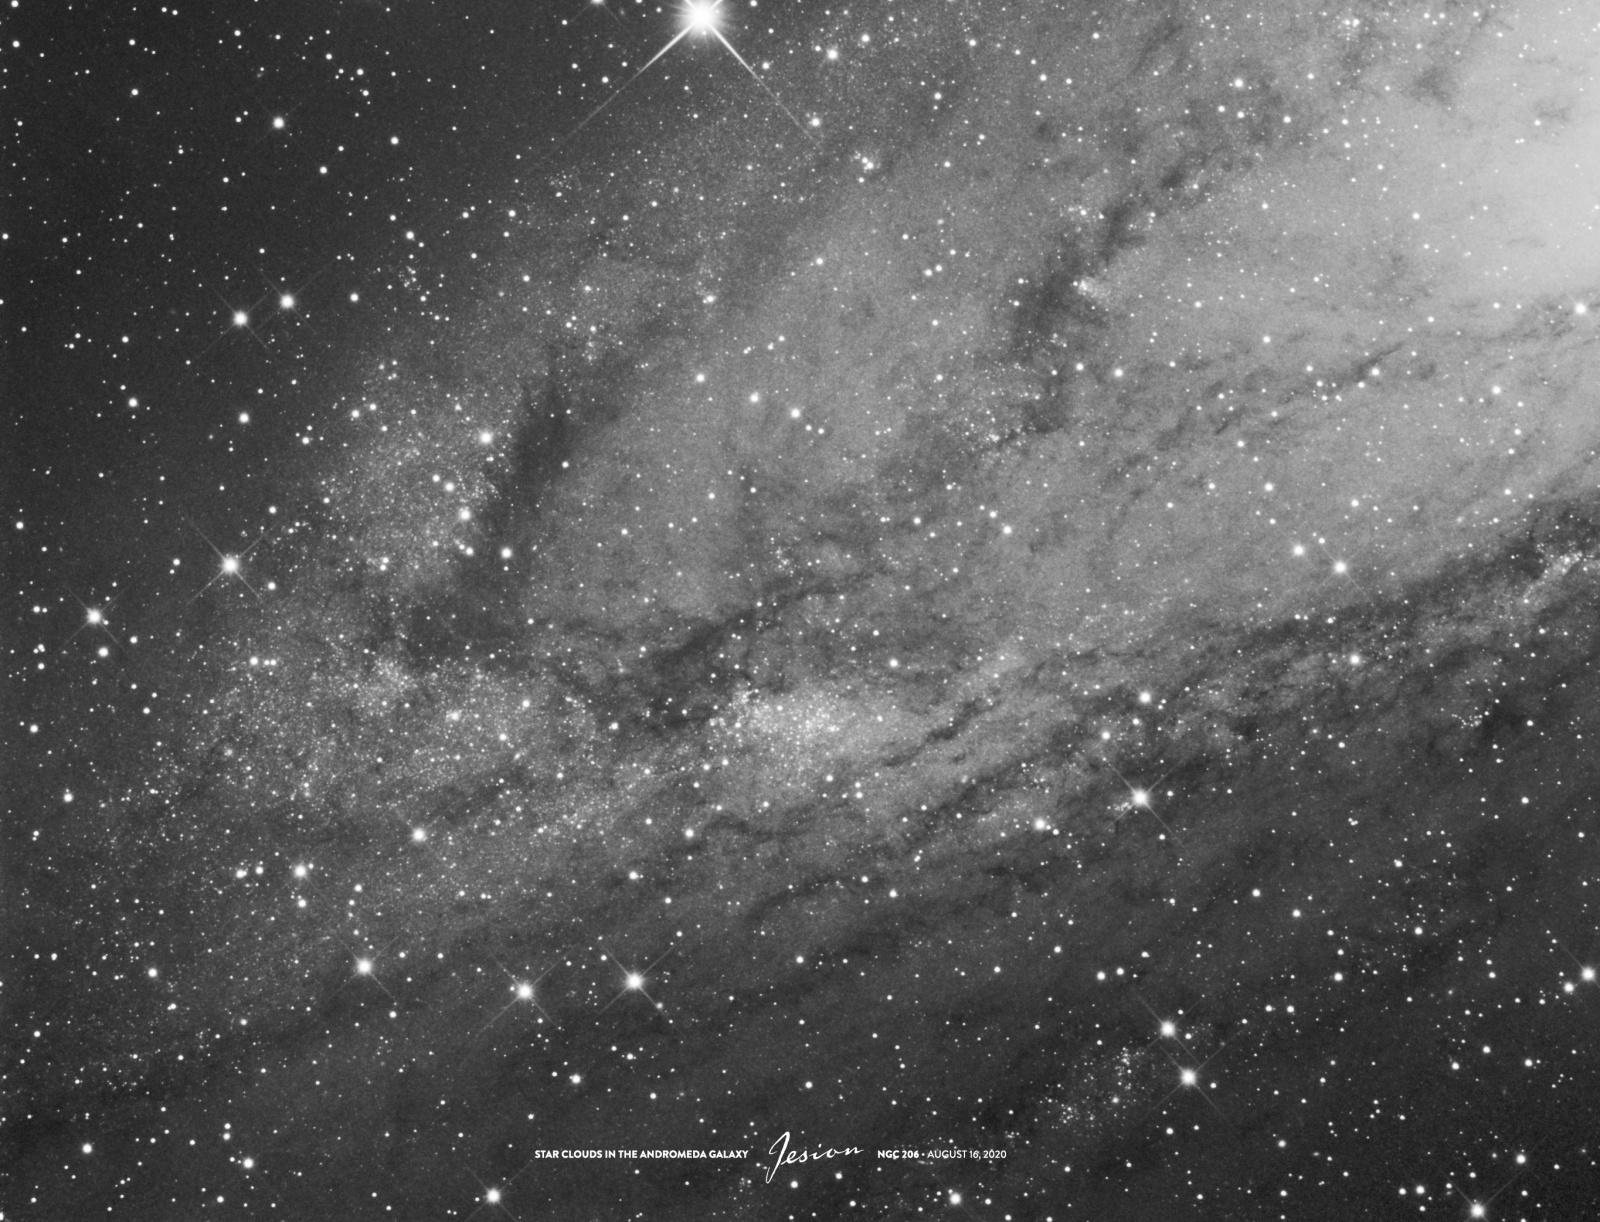 Star_Clouds_Andromeda-bw.jpg